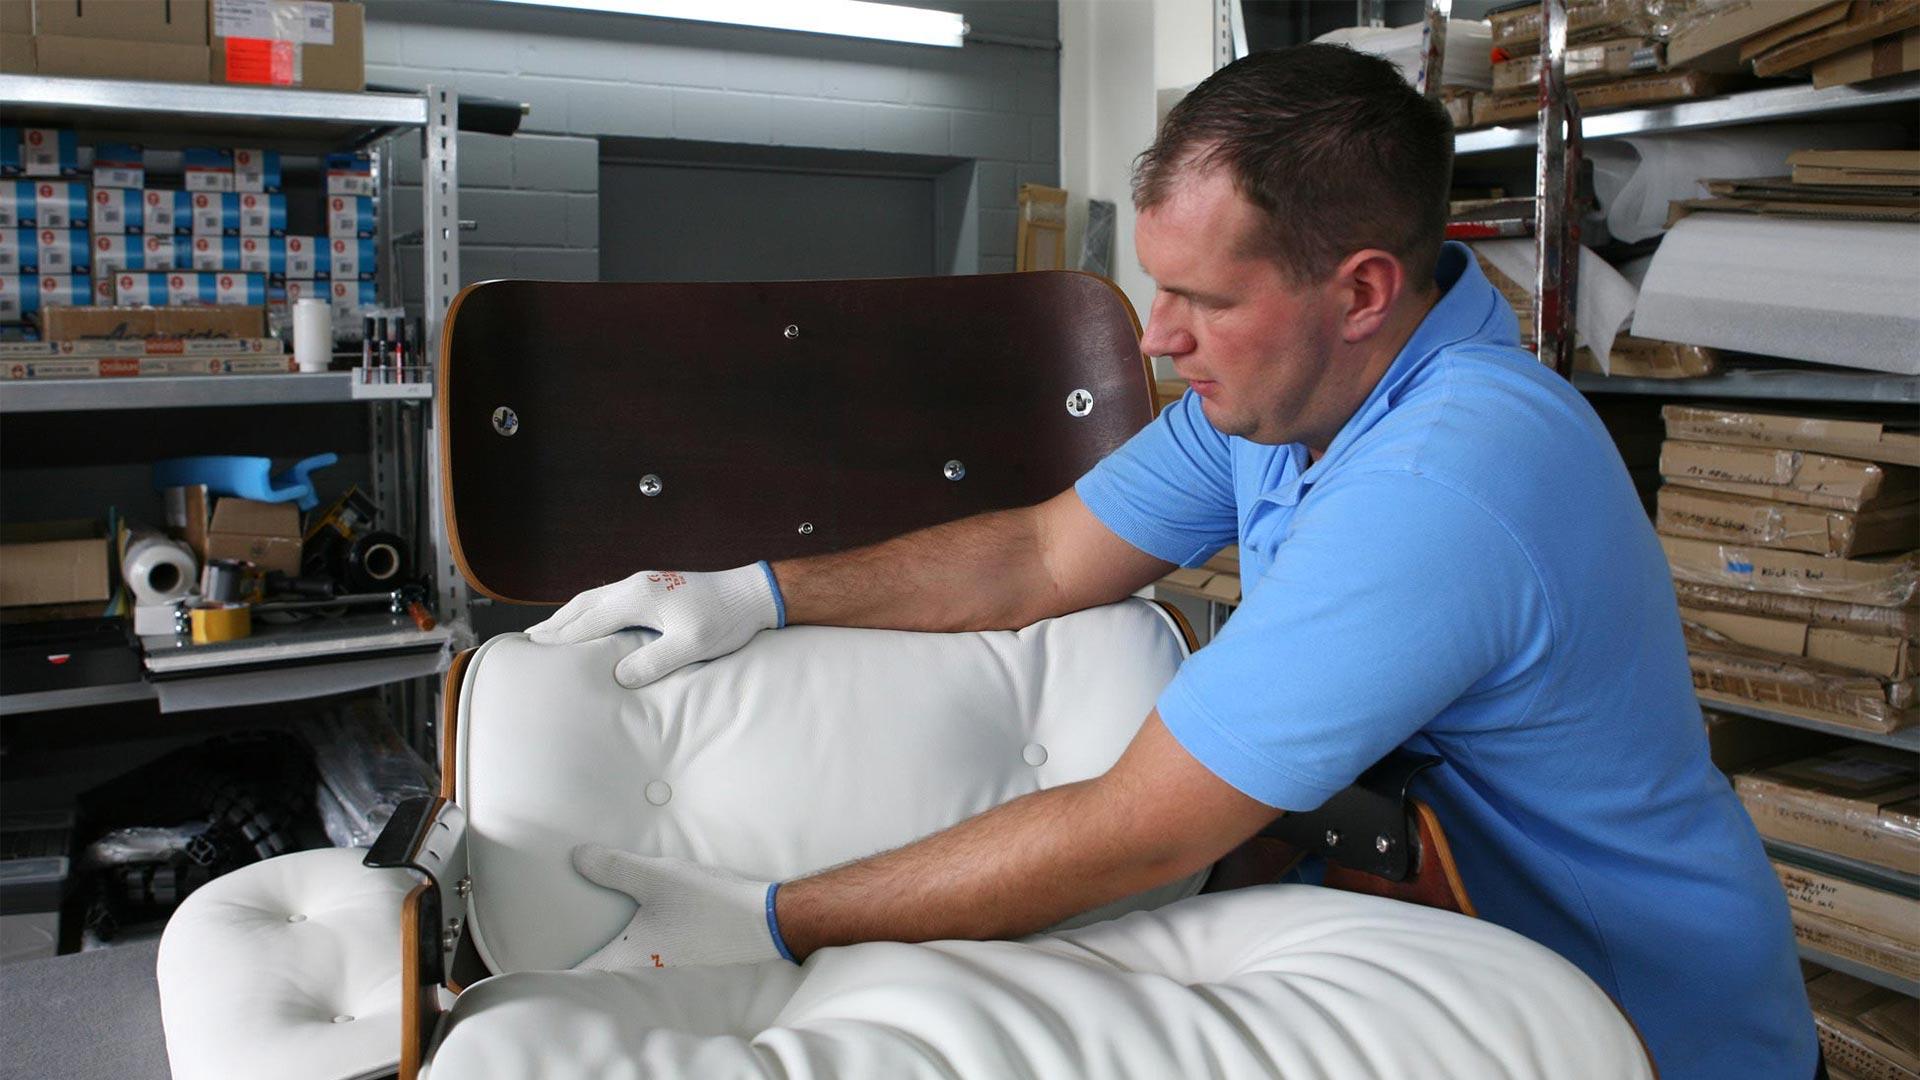 Reparatur Vitra Eames Lounge Chair Ersatzteile in Berlin bei steiden+04